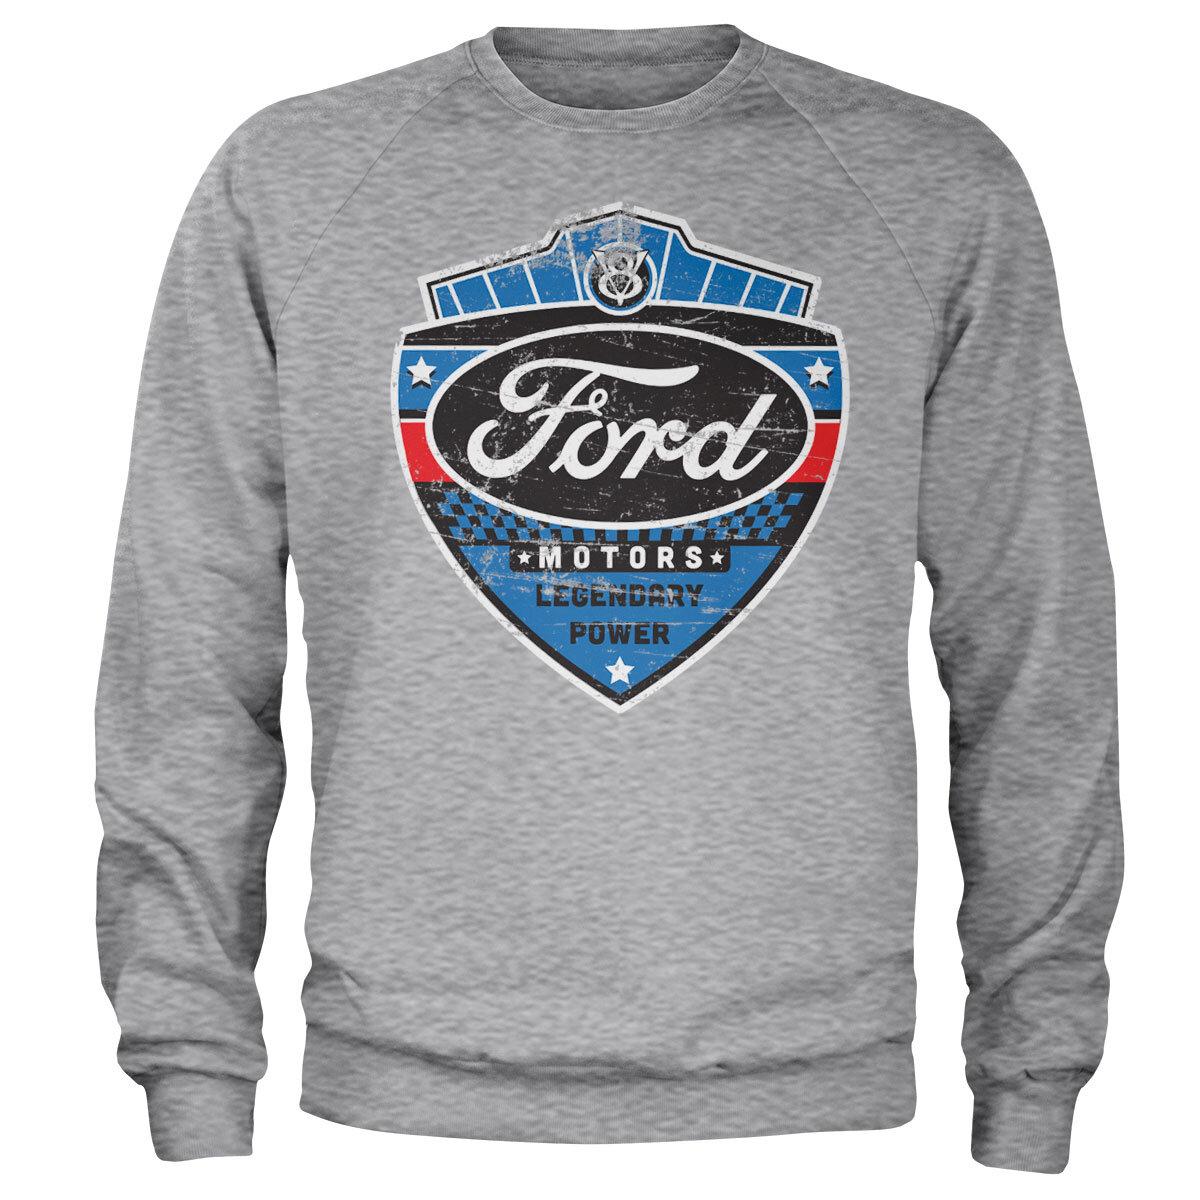 Ford - Legendary Power Sweatshirt